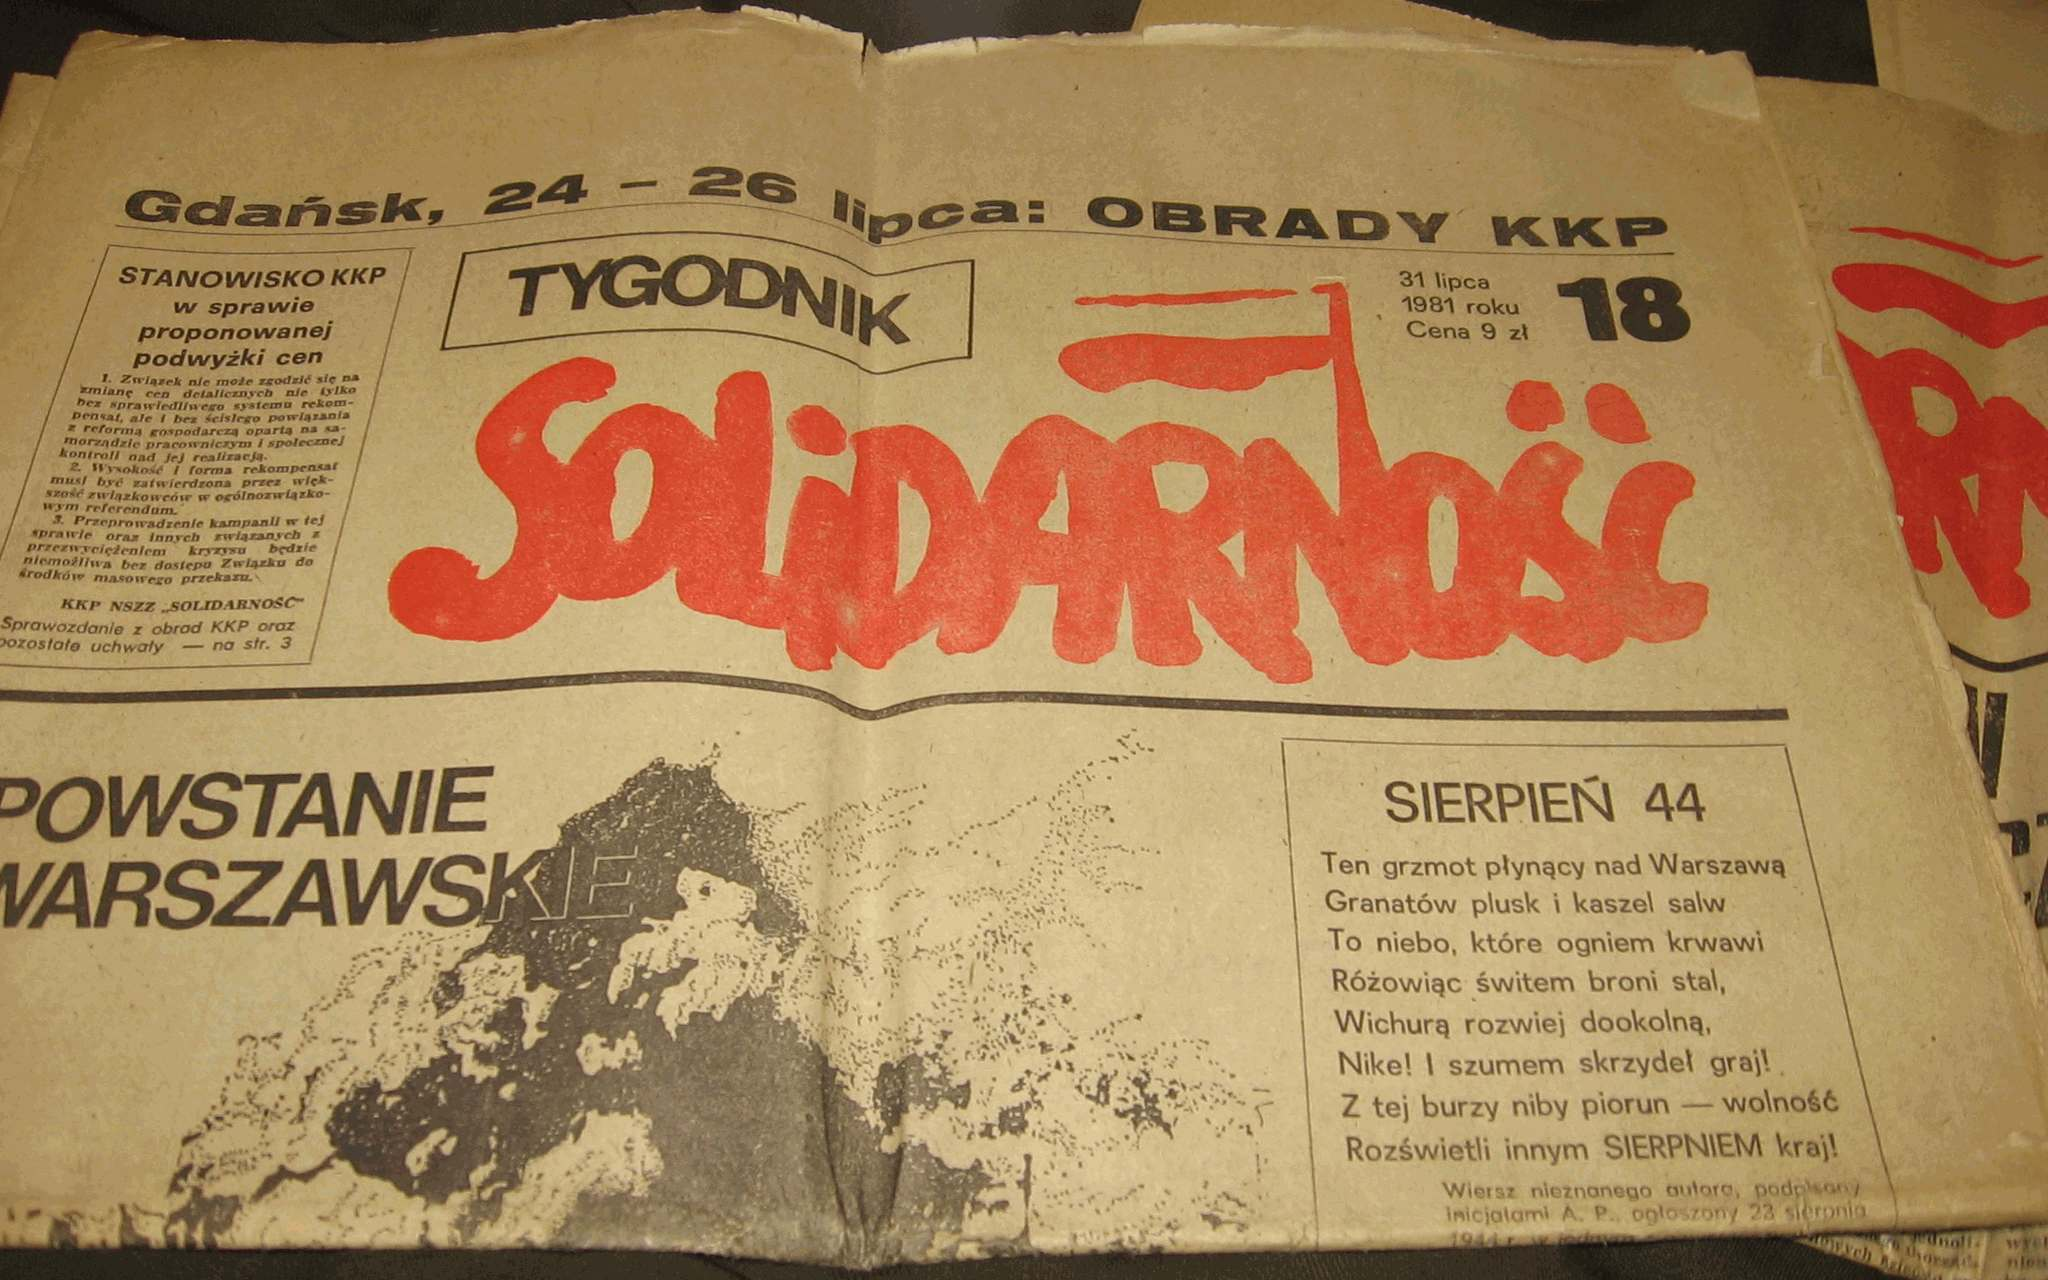 Archivotygodnik Solidarnosc 1981 Lipiecjpg Wikipedia La